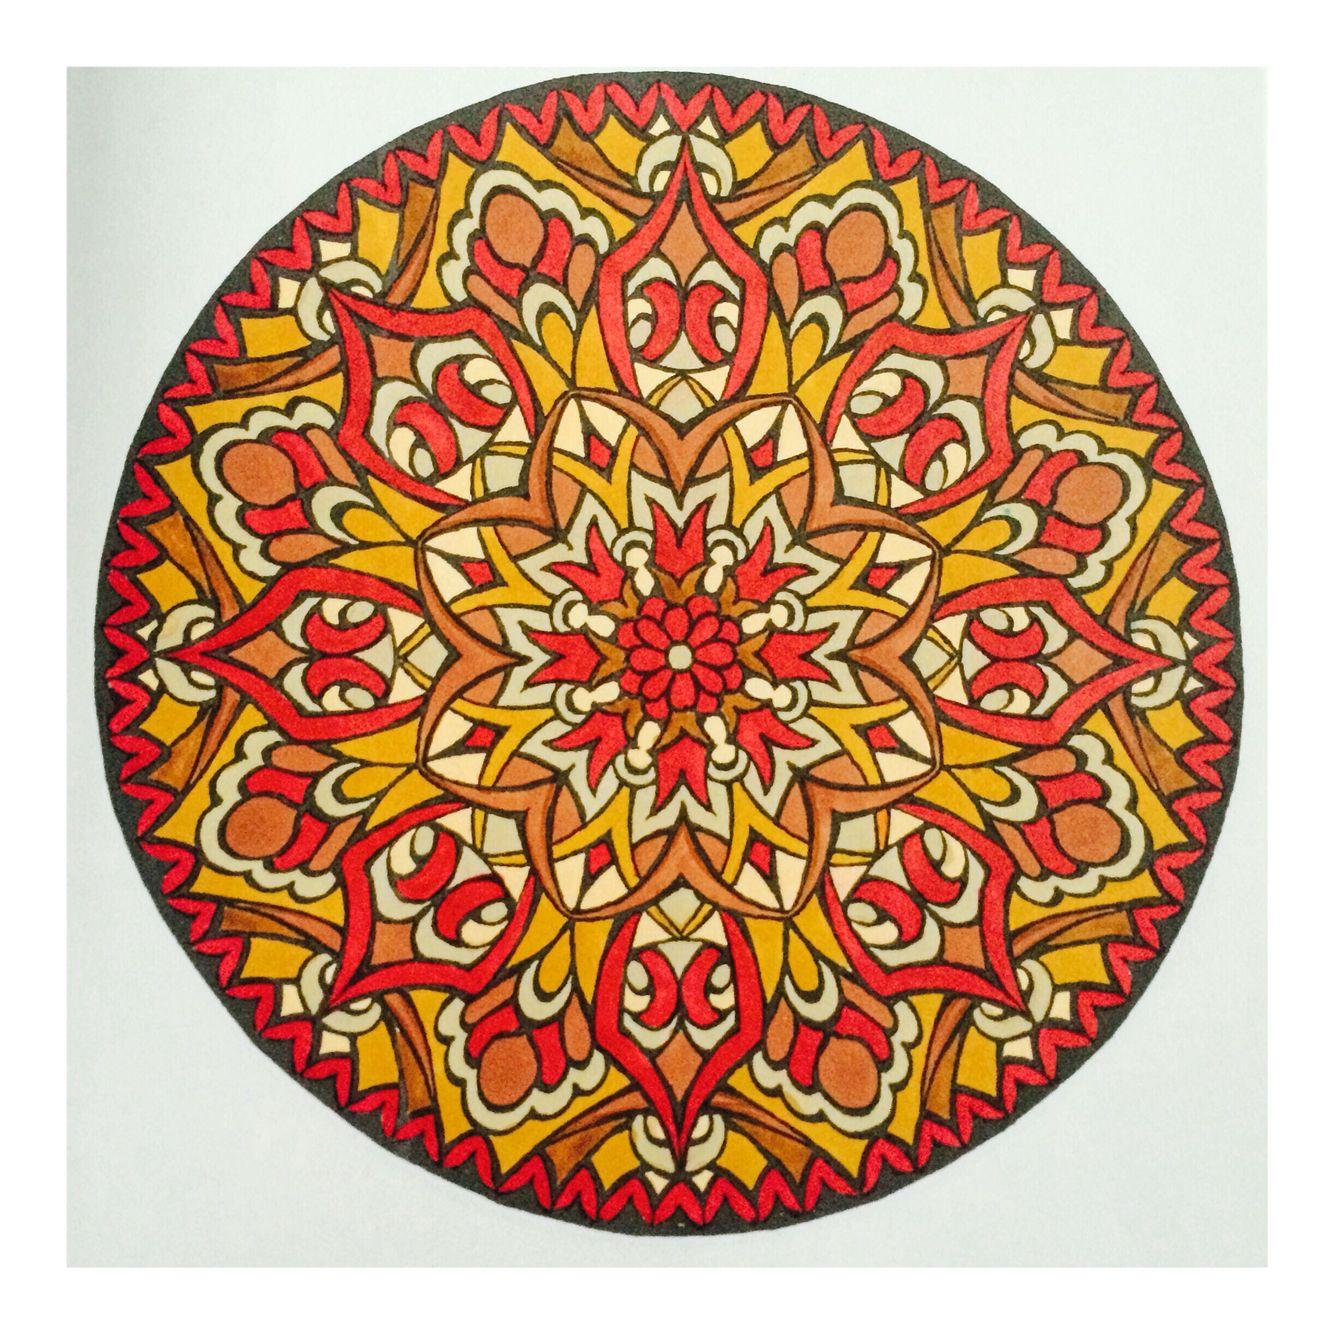 Mandala | Coloring Book | Pinterest | Coloring books and Mandala